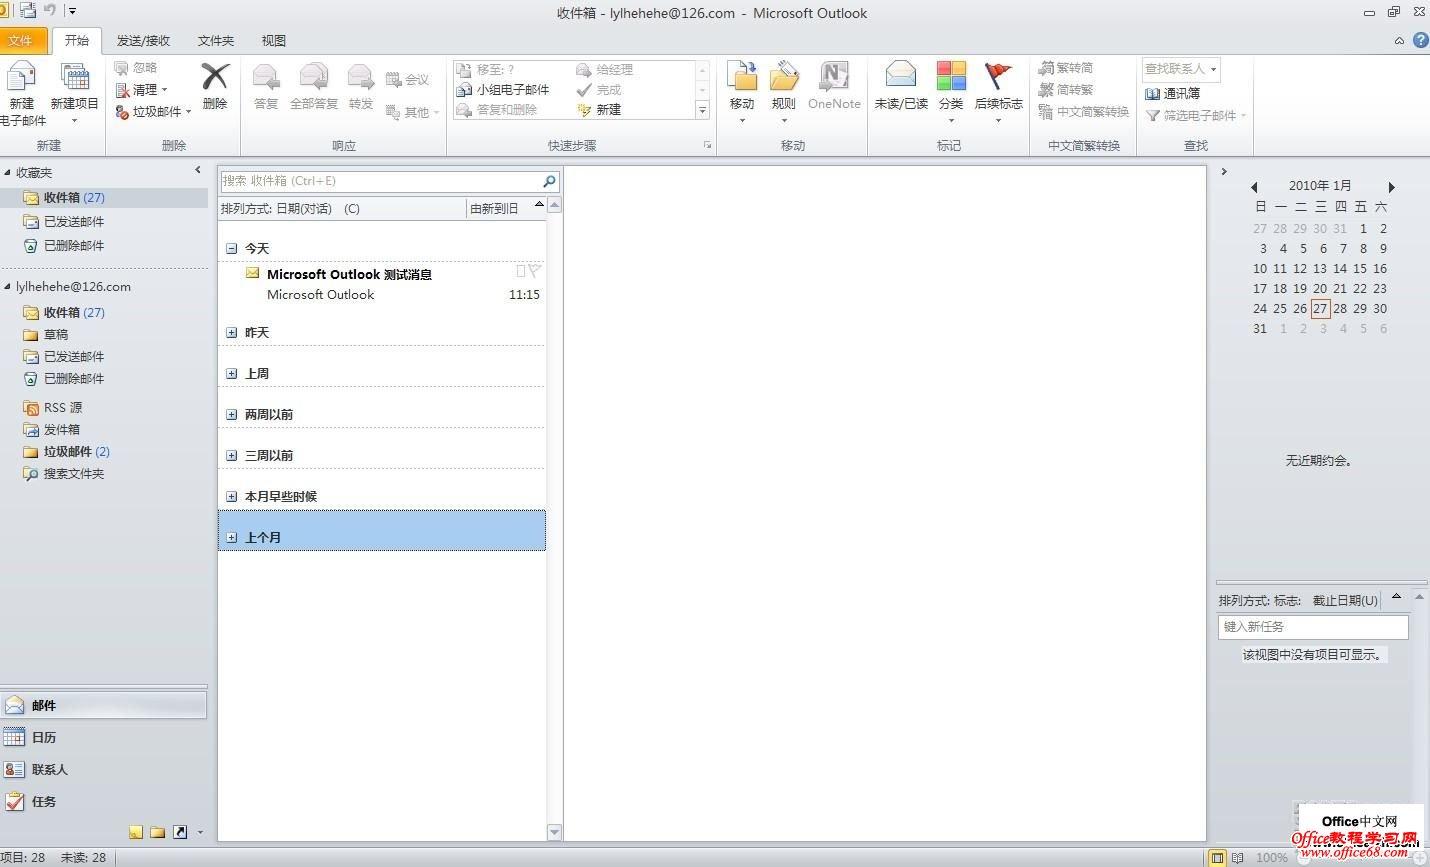 OUTLOOK2010配置及签名基础教程5